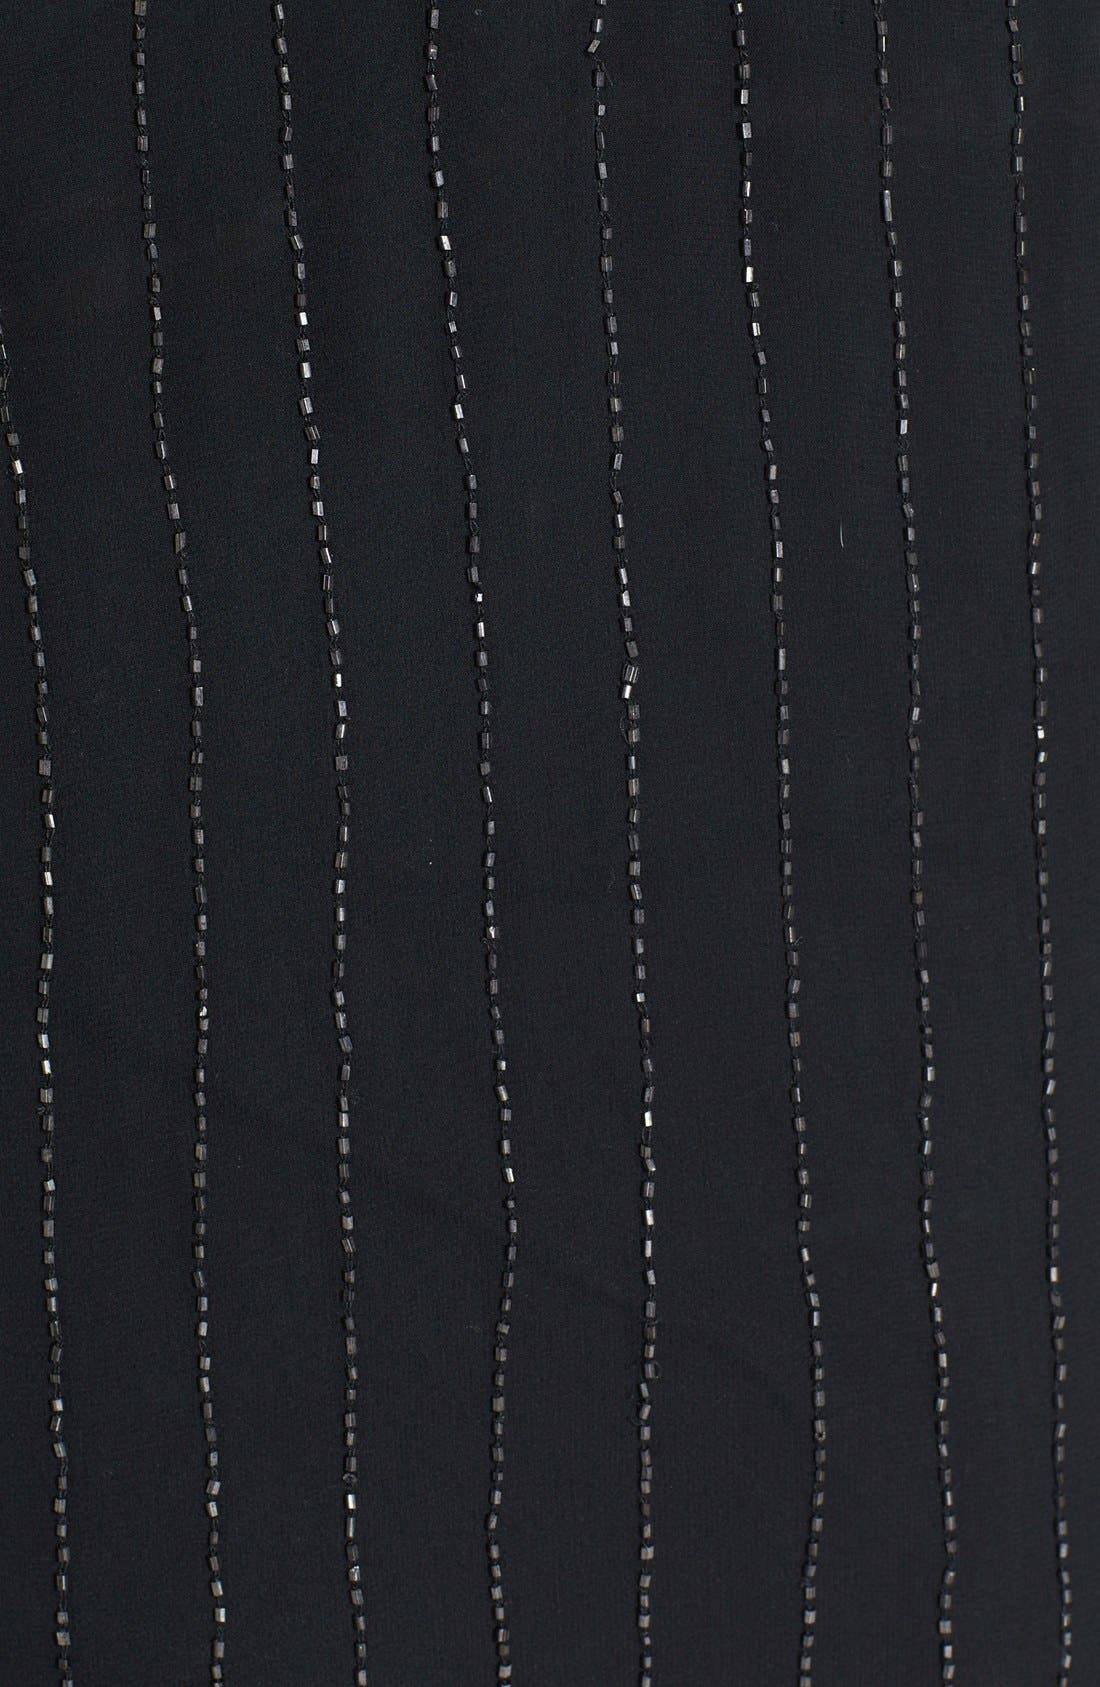 JOIE,                             'Mendira' Beaded Silk Top,                             Alternate thumbnail 2, color,                             002